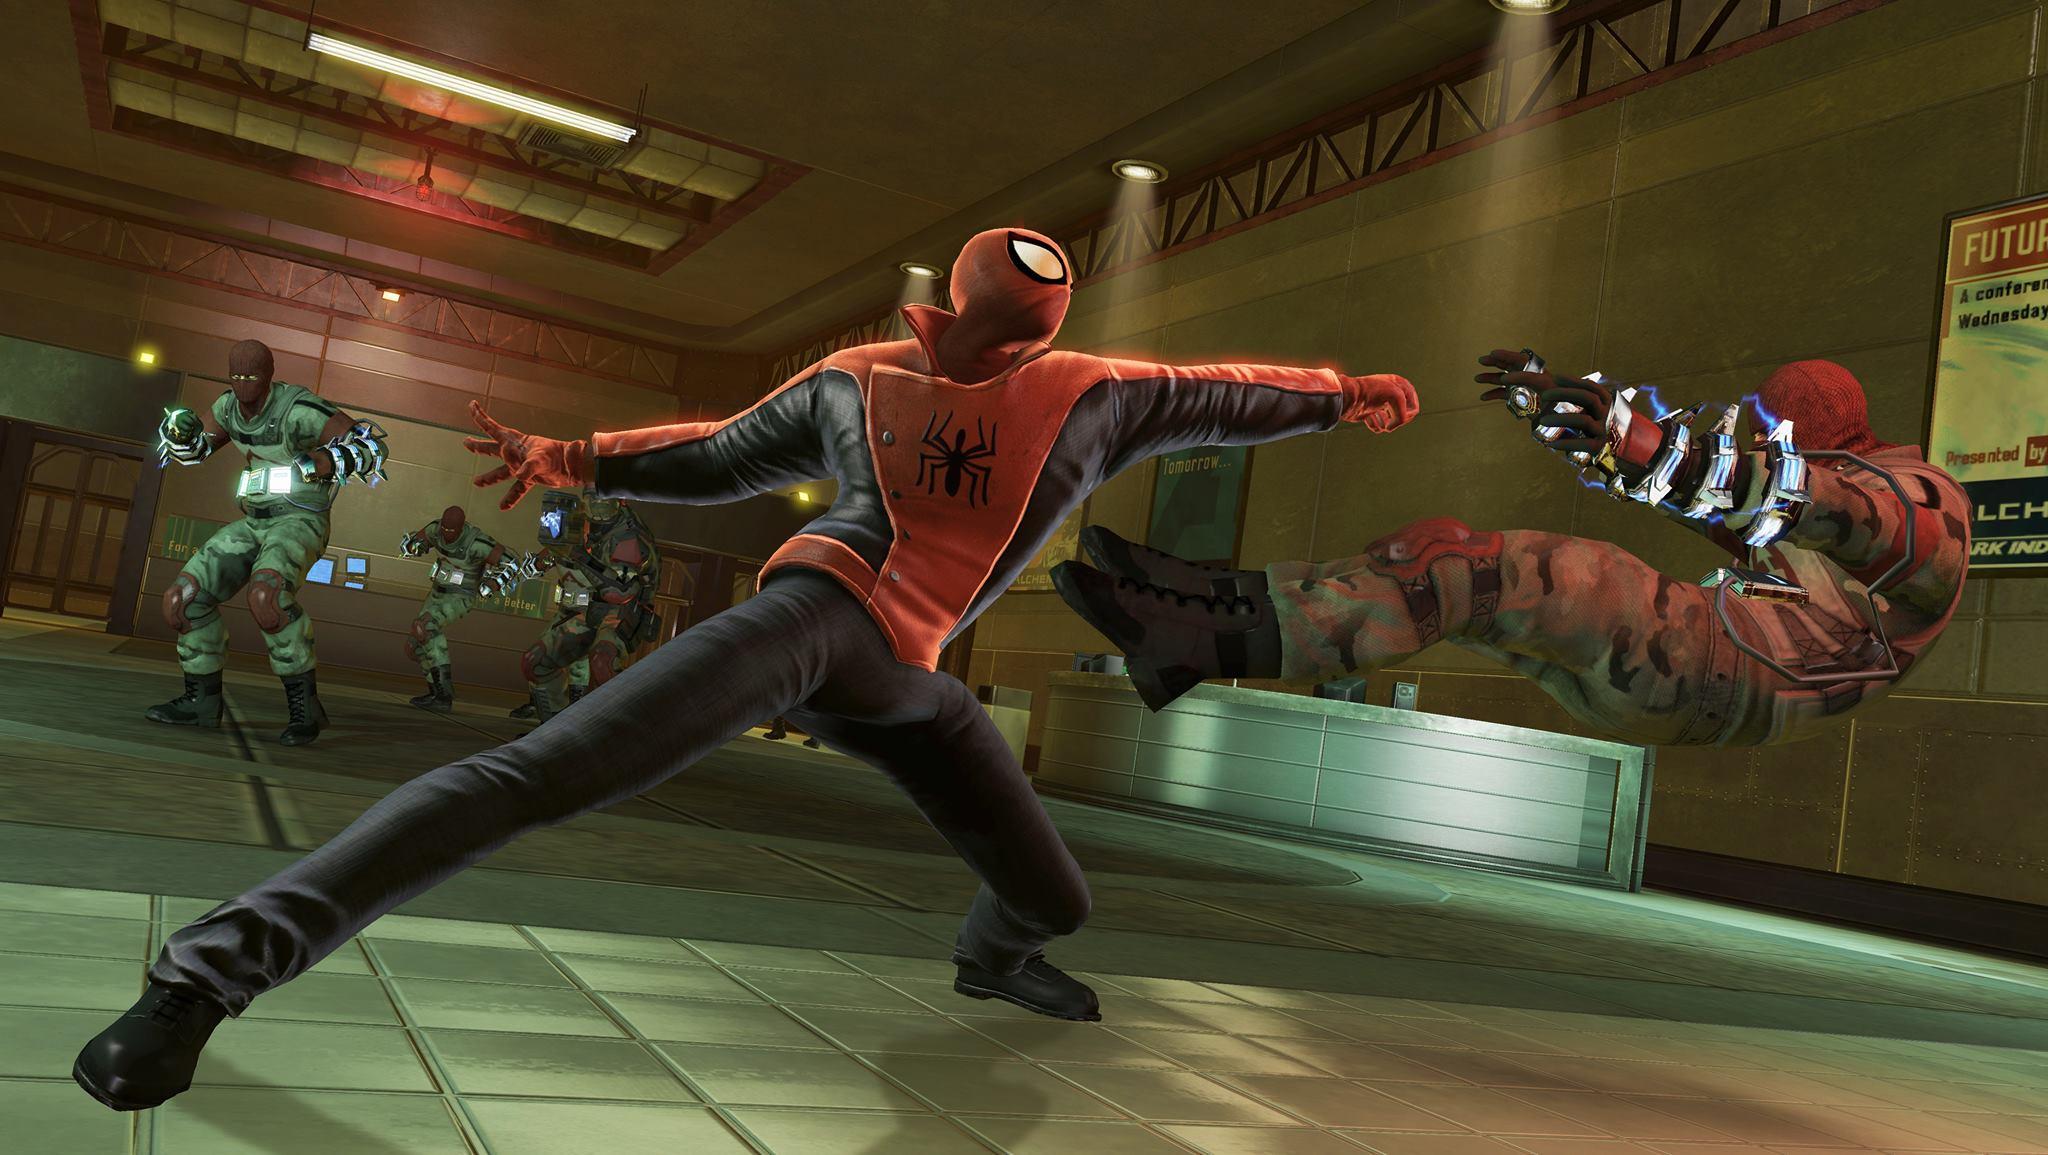 the amazing spider-man 2 gameplay trailer | gamingshogun